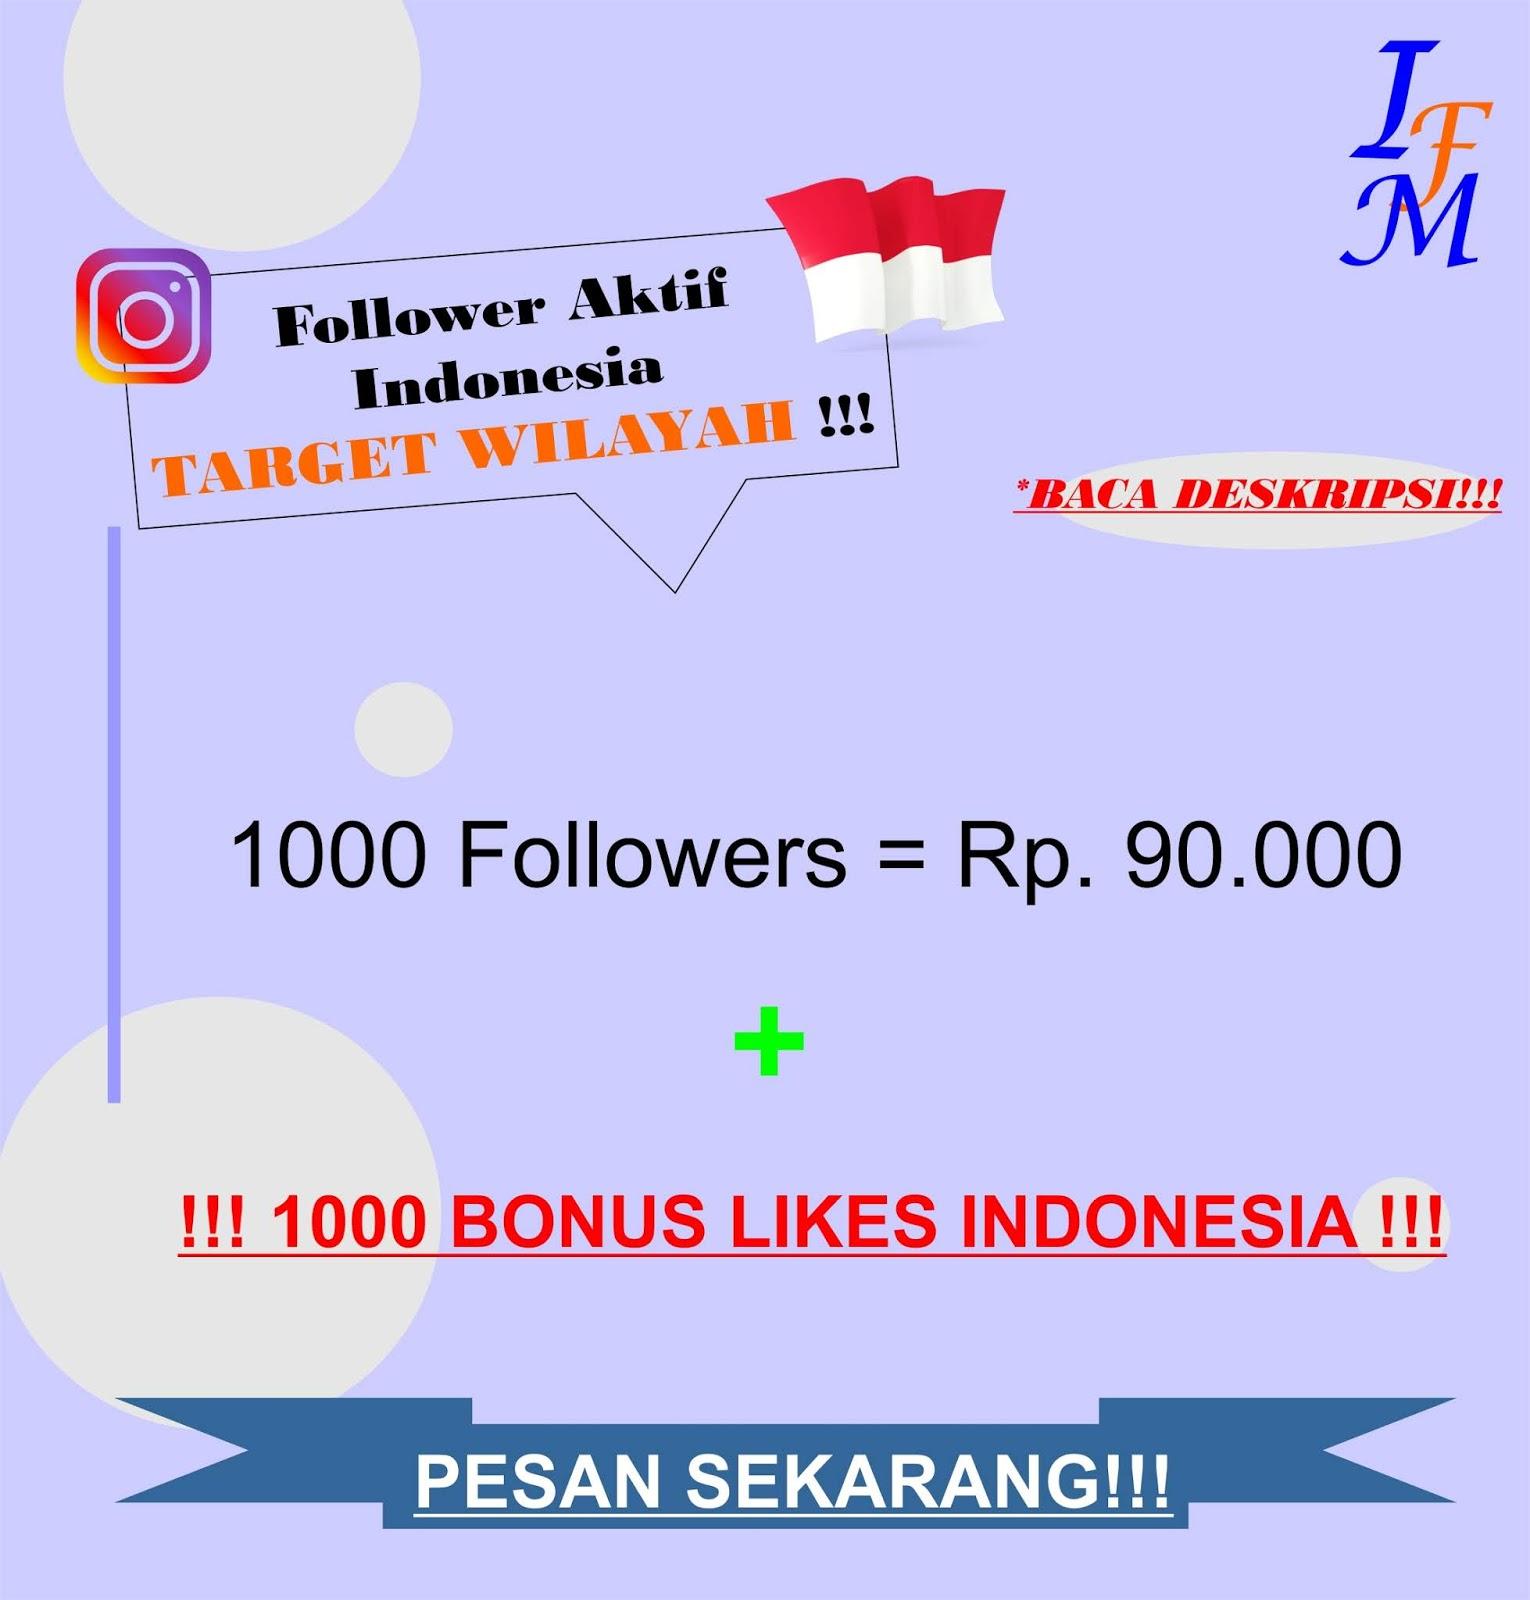 Jasa Tambah 1000 Follower Akun Instagram Aktif Indonesia Target Wilayah Murah